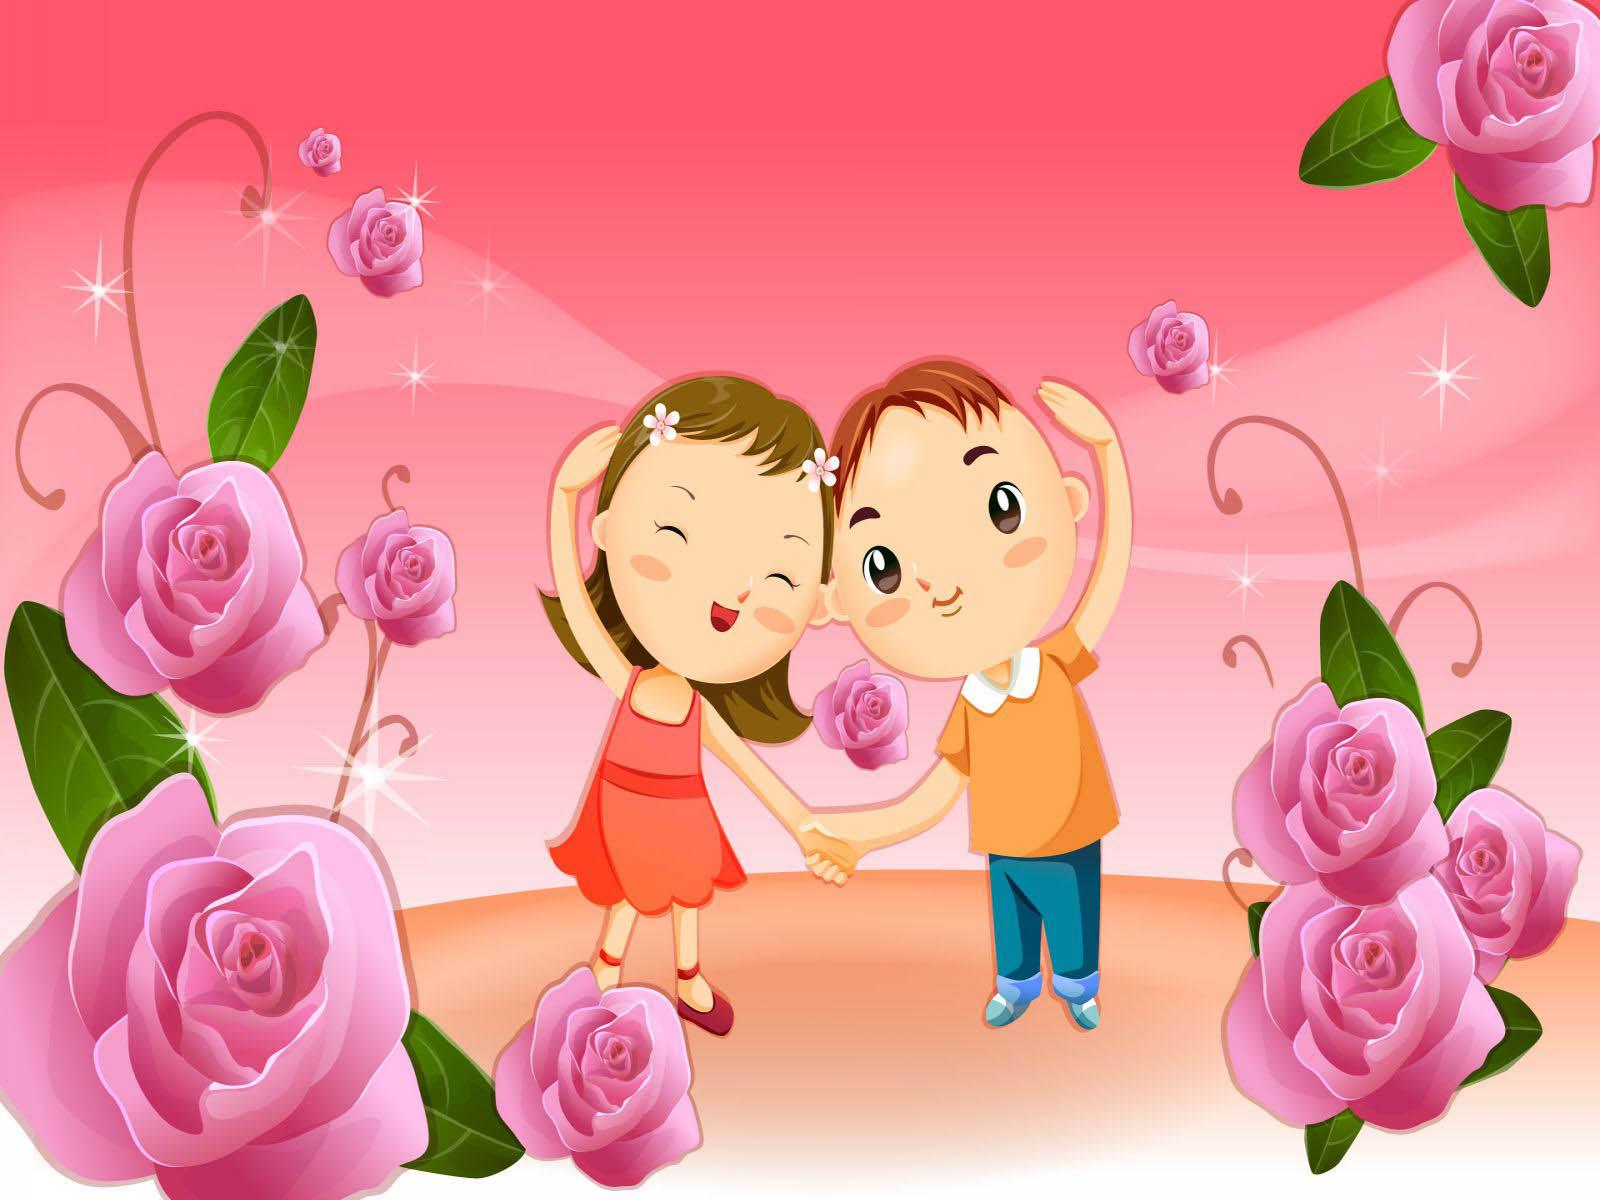 Kumpulan Gambar Animasi Romantis Dan Sweet